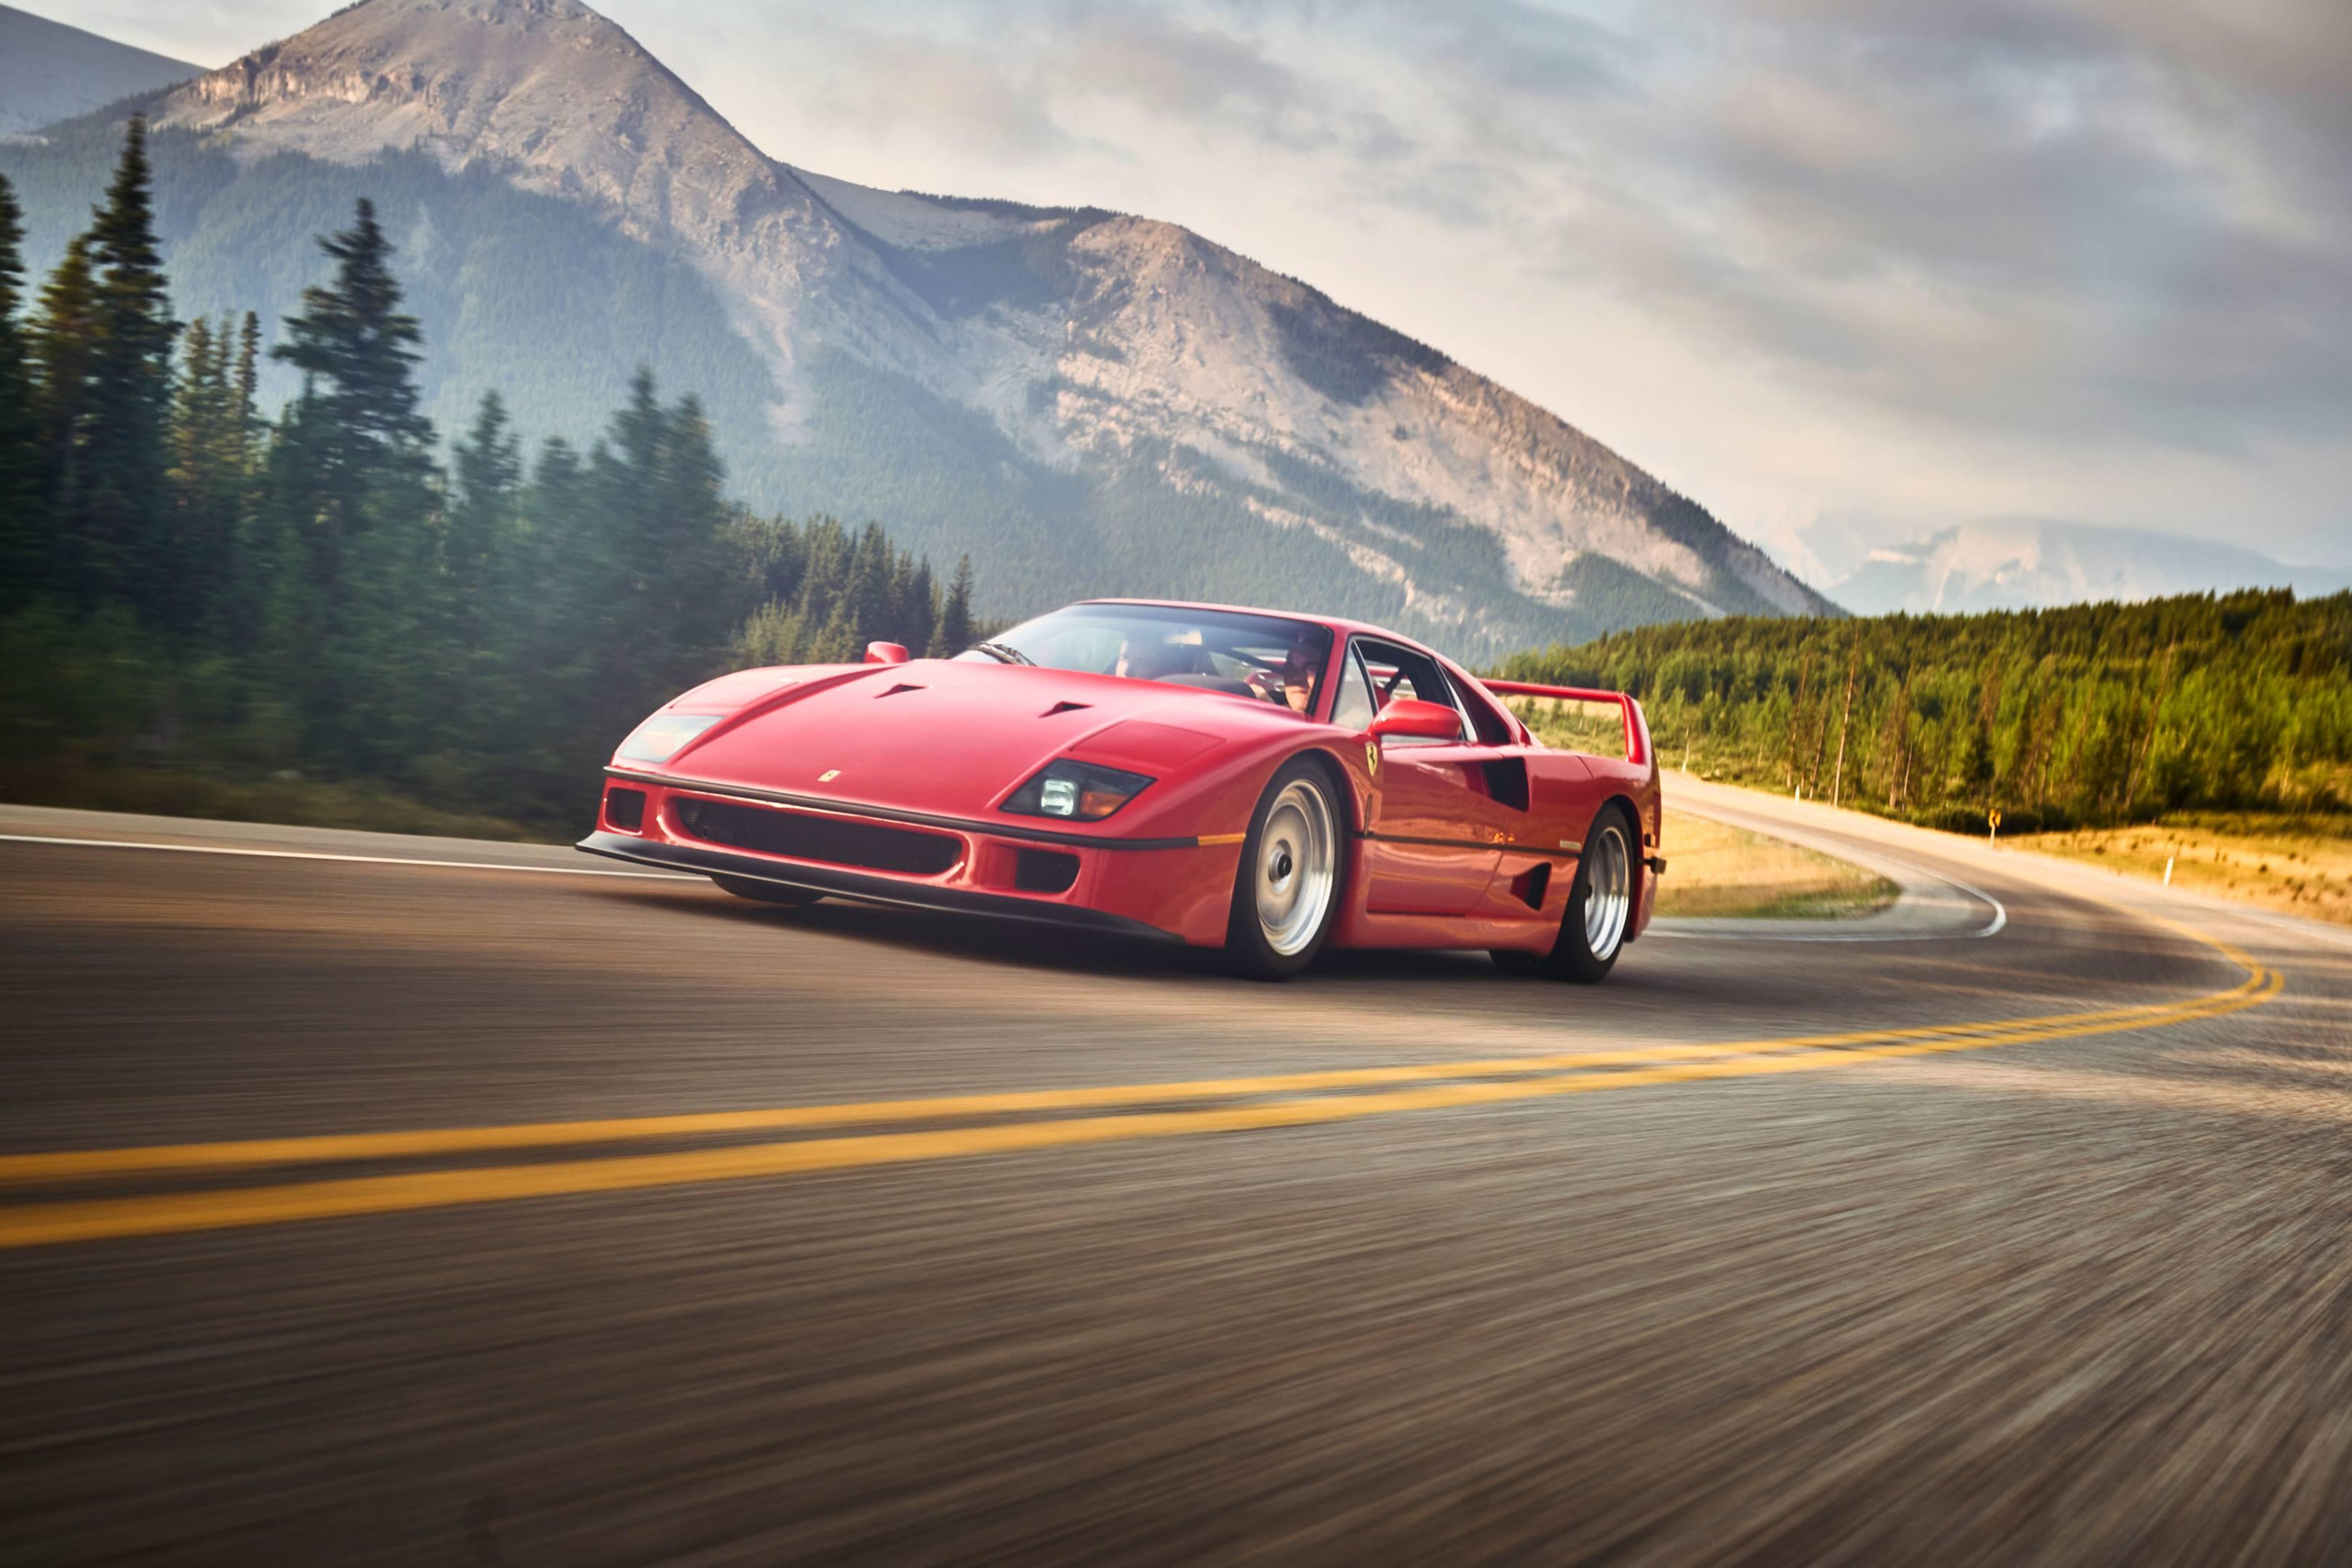 Ferrari F40 on the open road